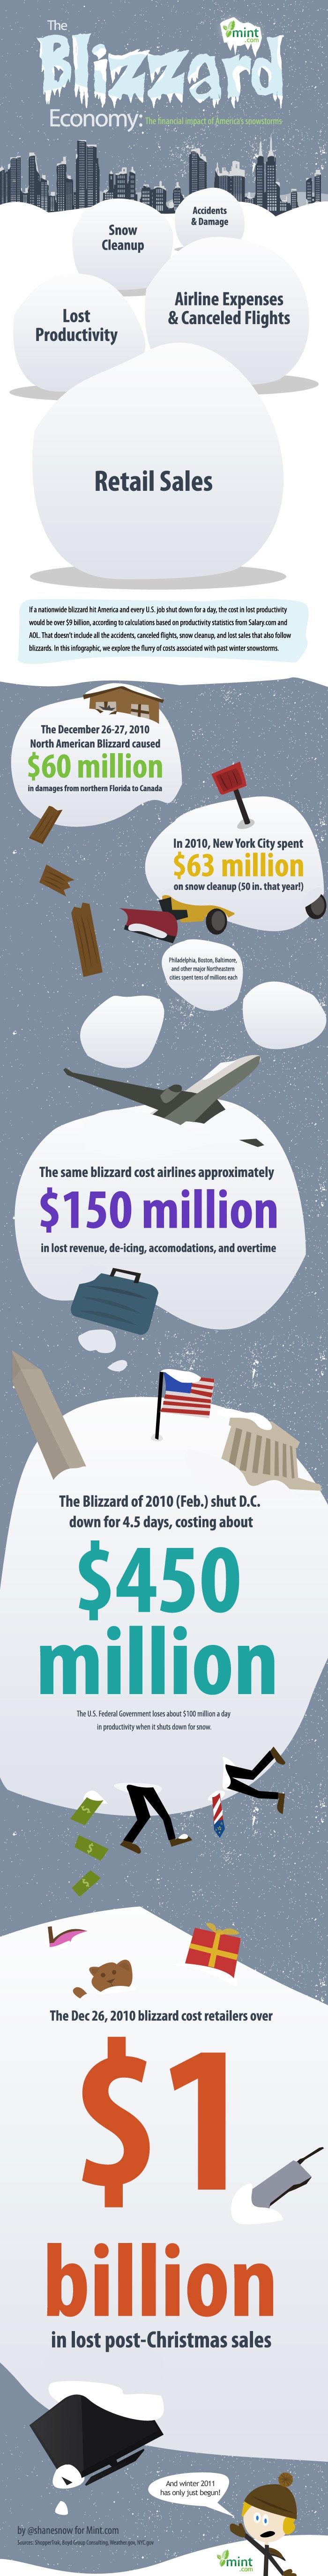 05 mint-blizzard-infographic